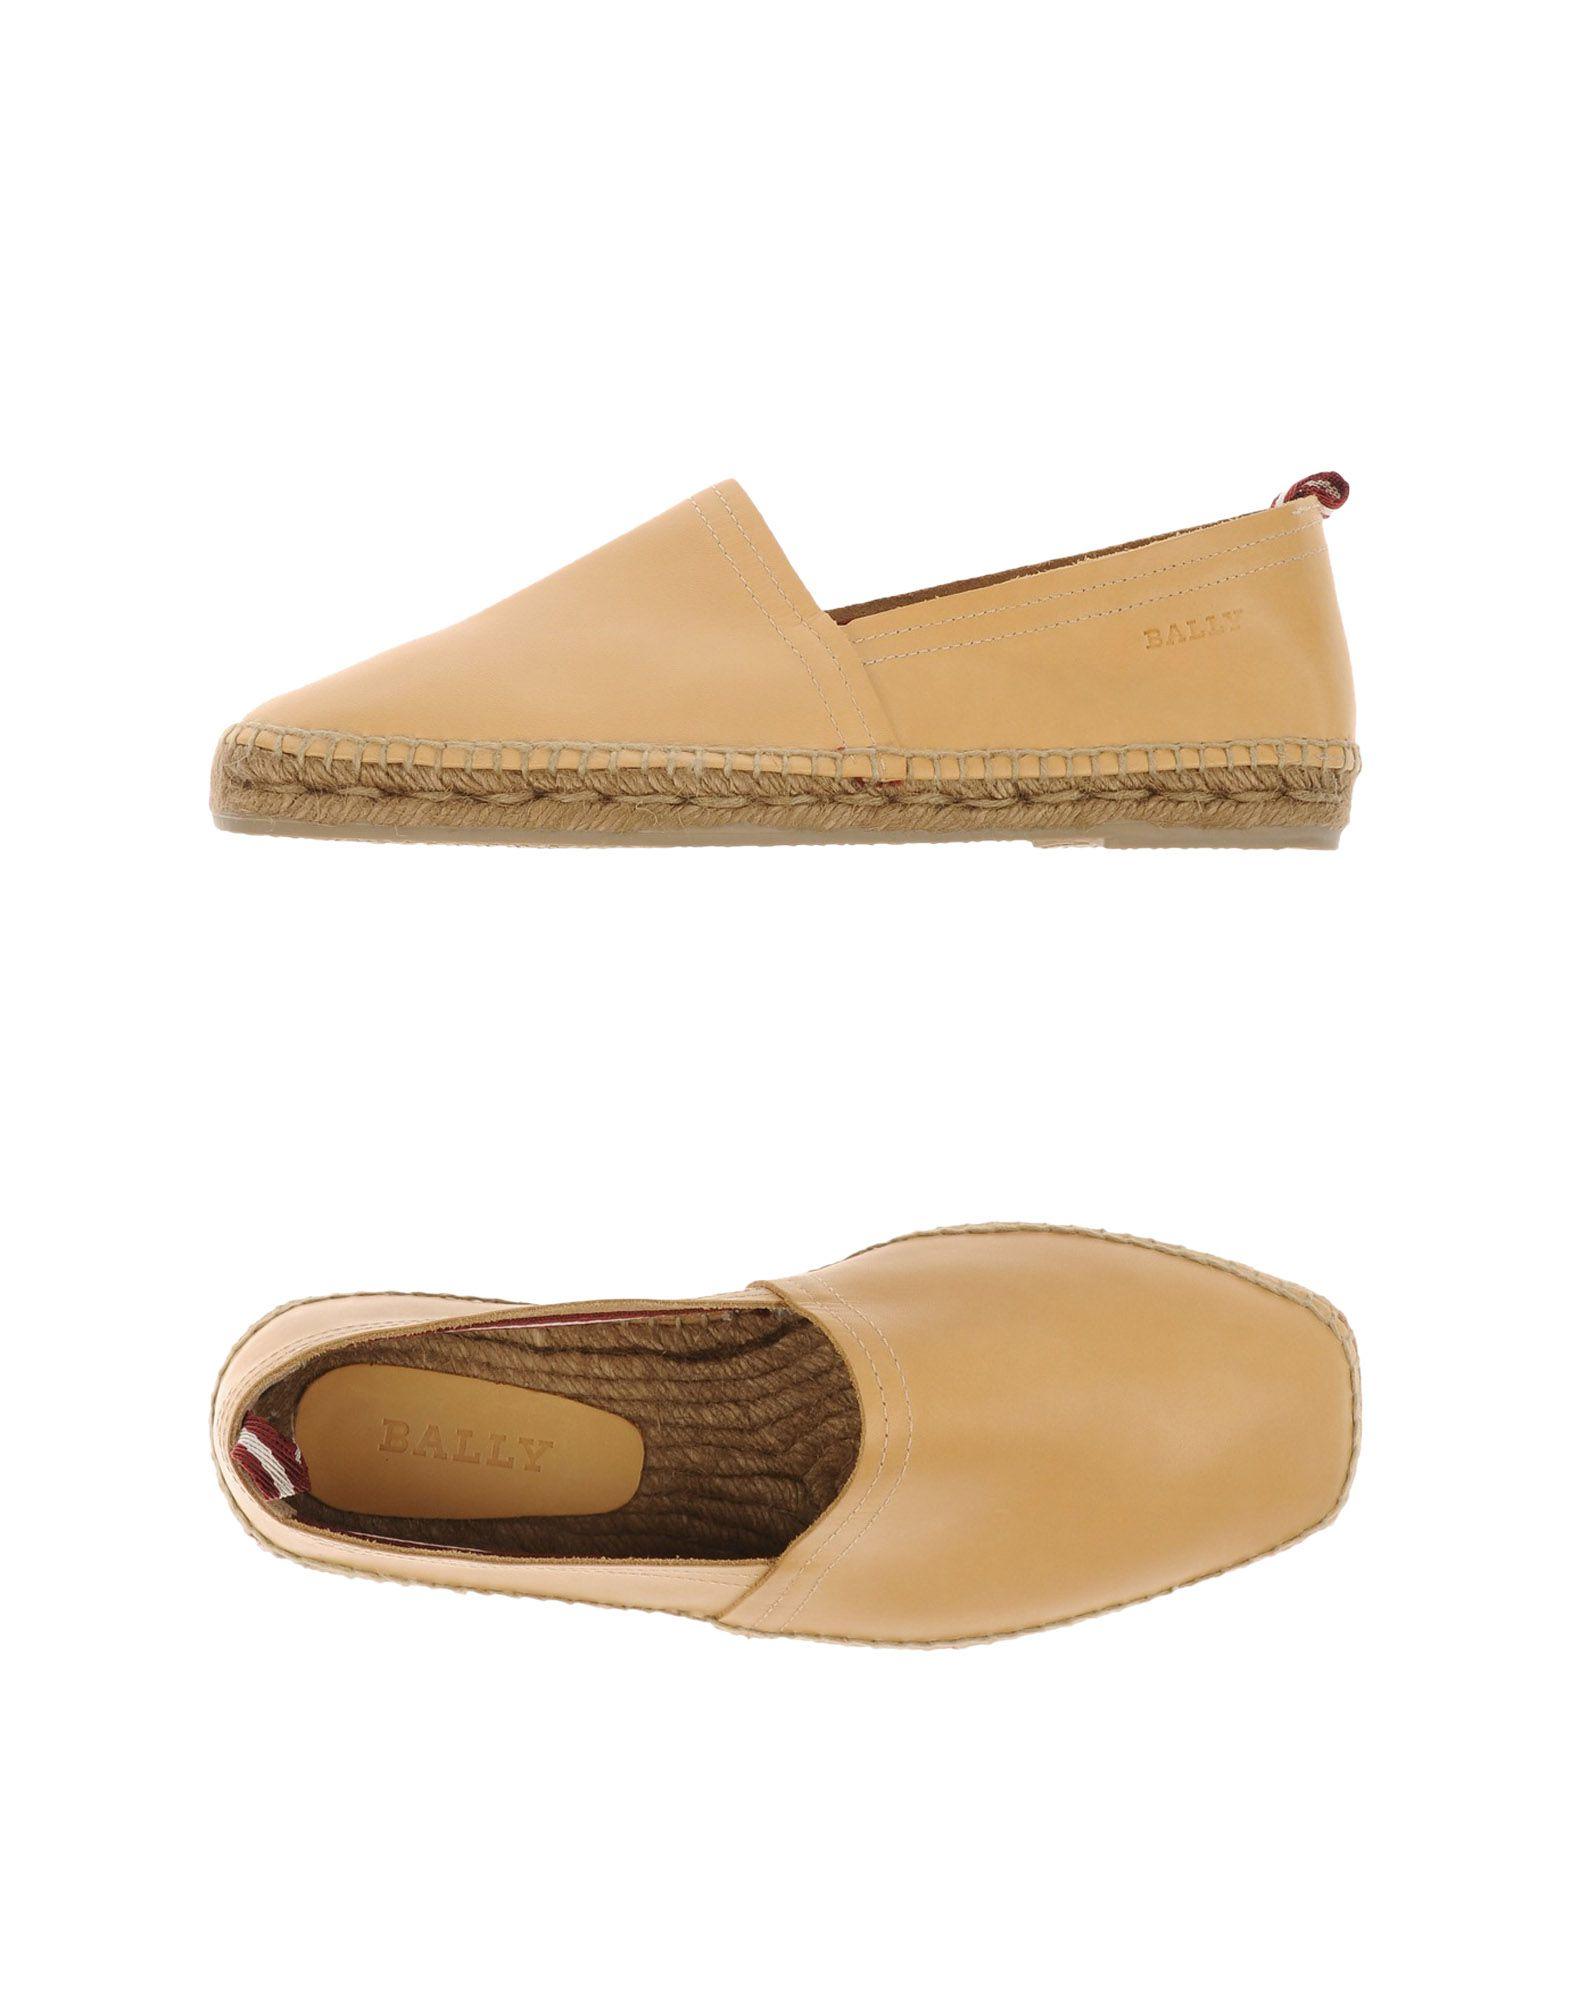 e5a8d7c344 bally-sand-espadrilles-beige-product-0-351072640-normal.jpeg